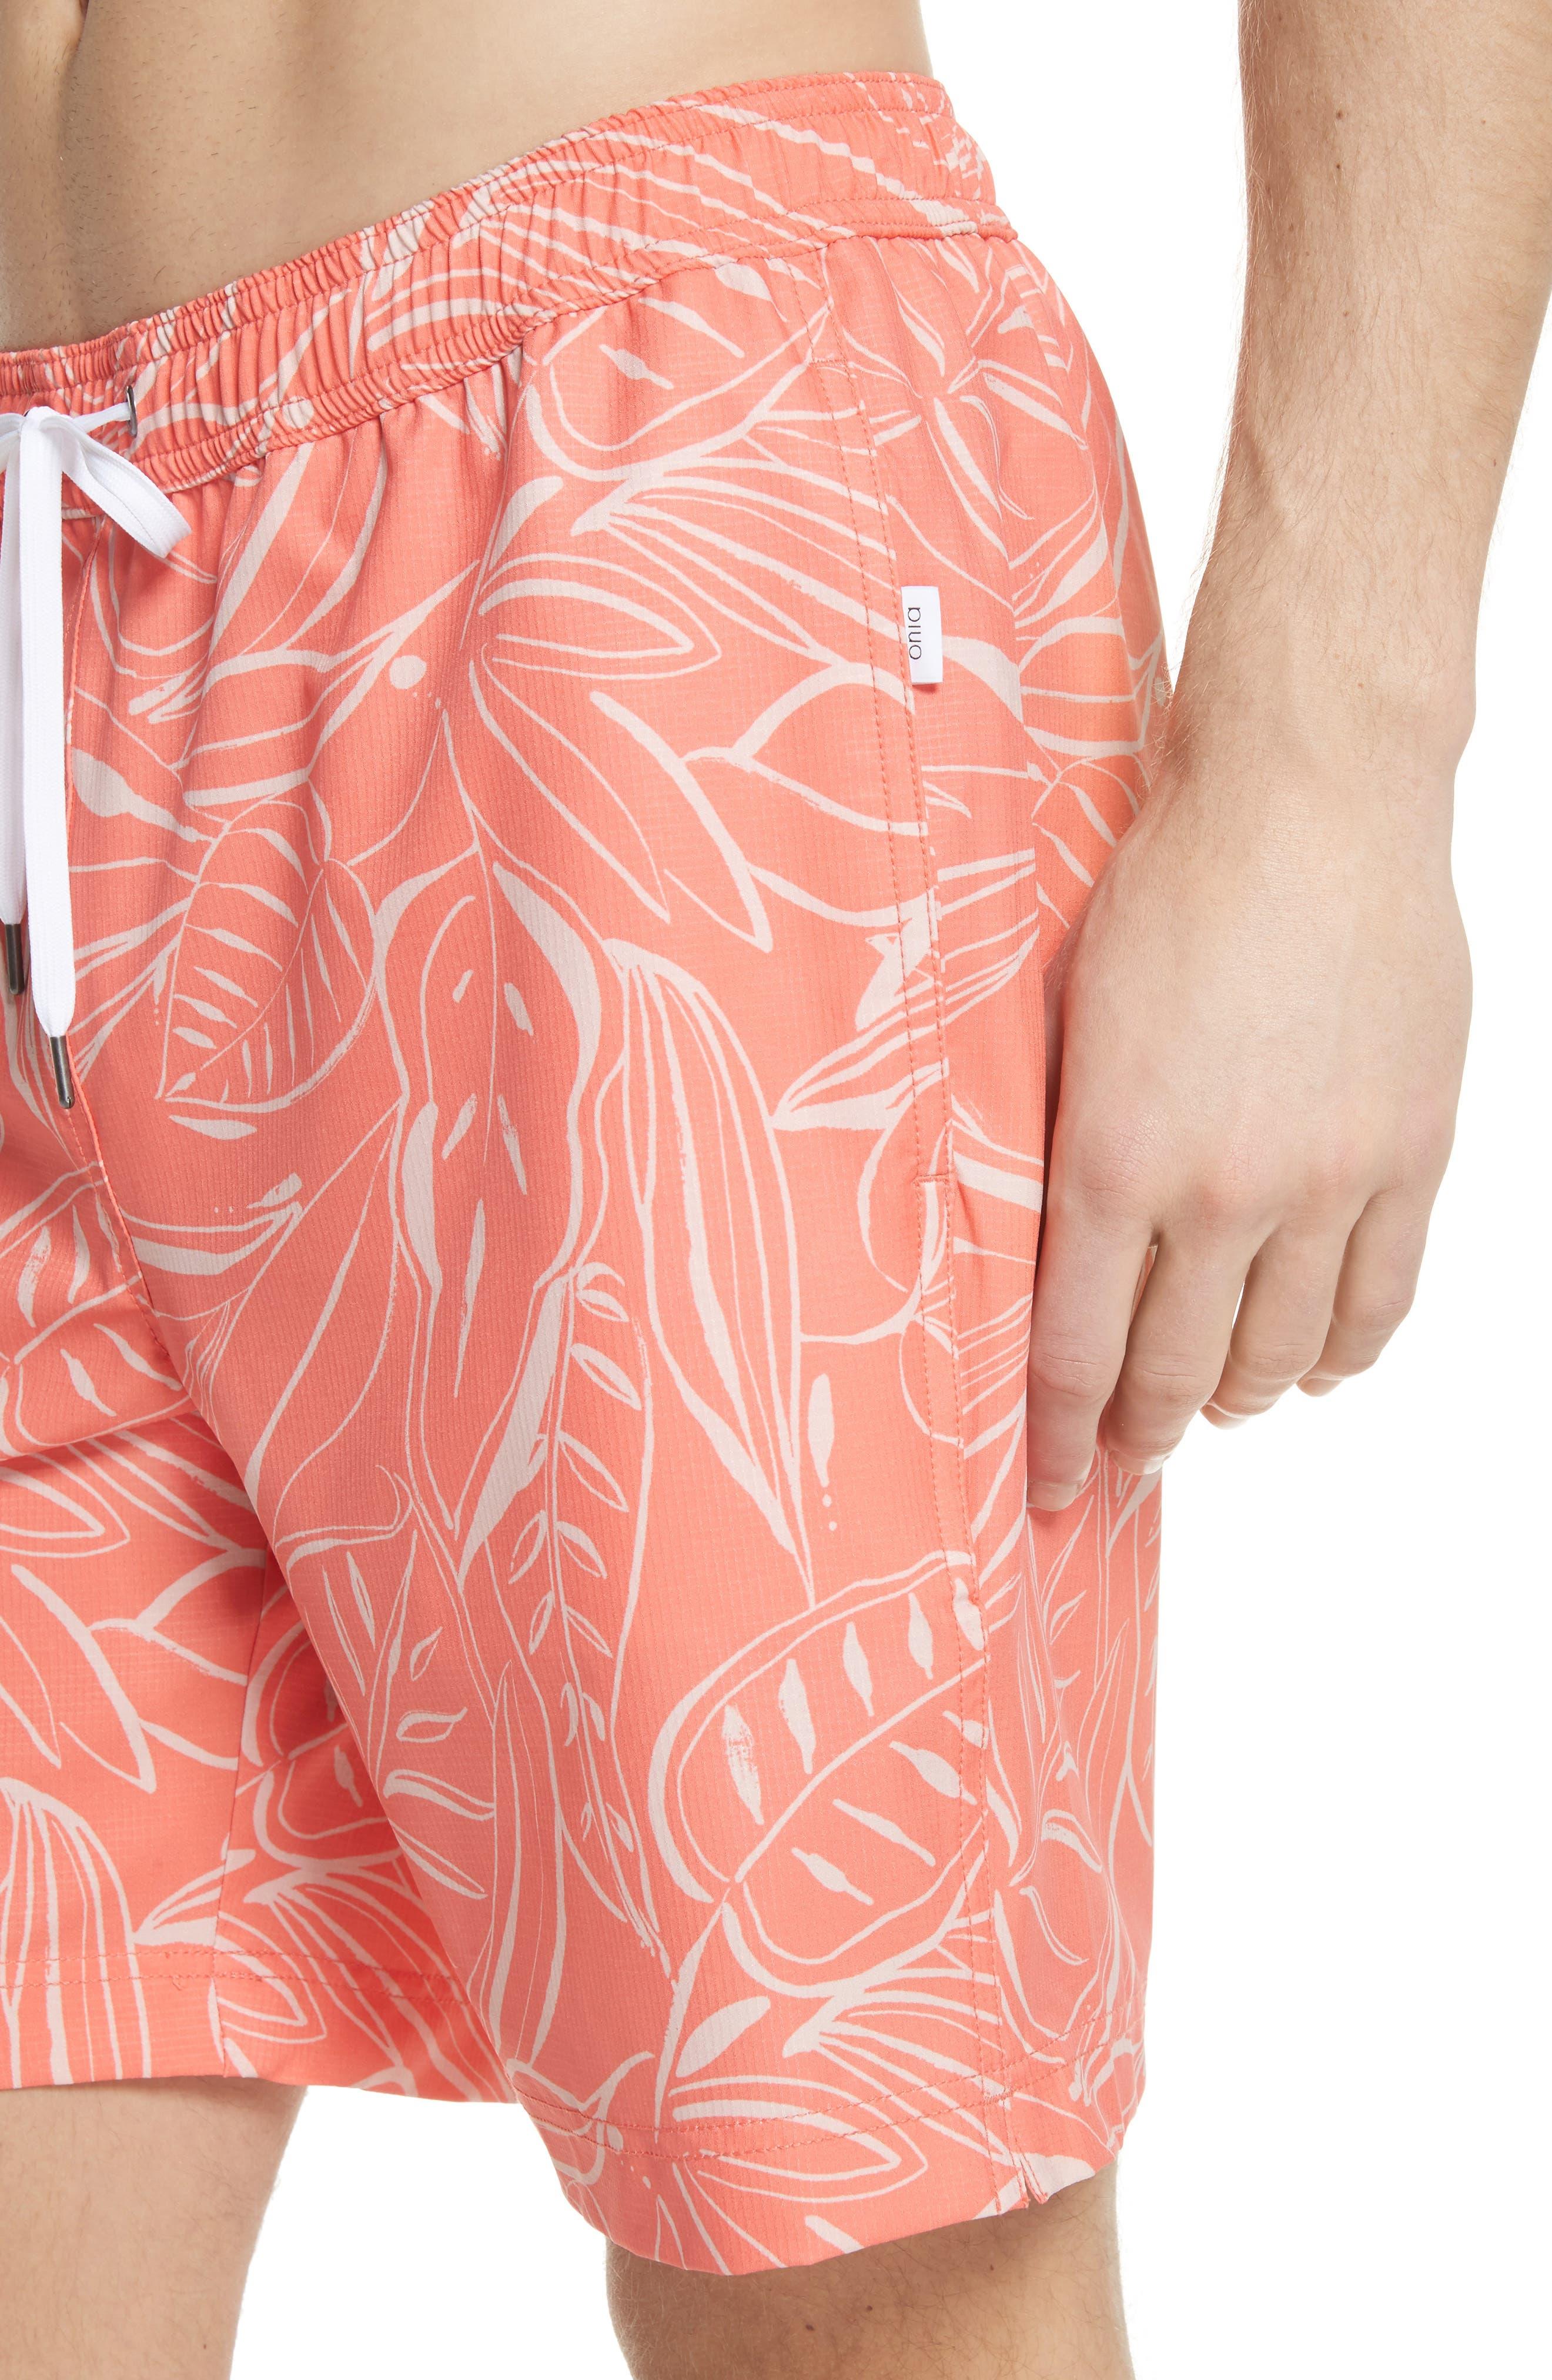 Charles Leaf Print Swim Trunks,                             Alternate thumbnail 4, color,                             Tangerine Coral